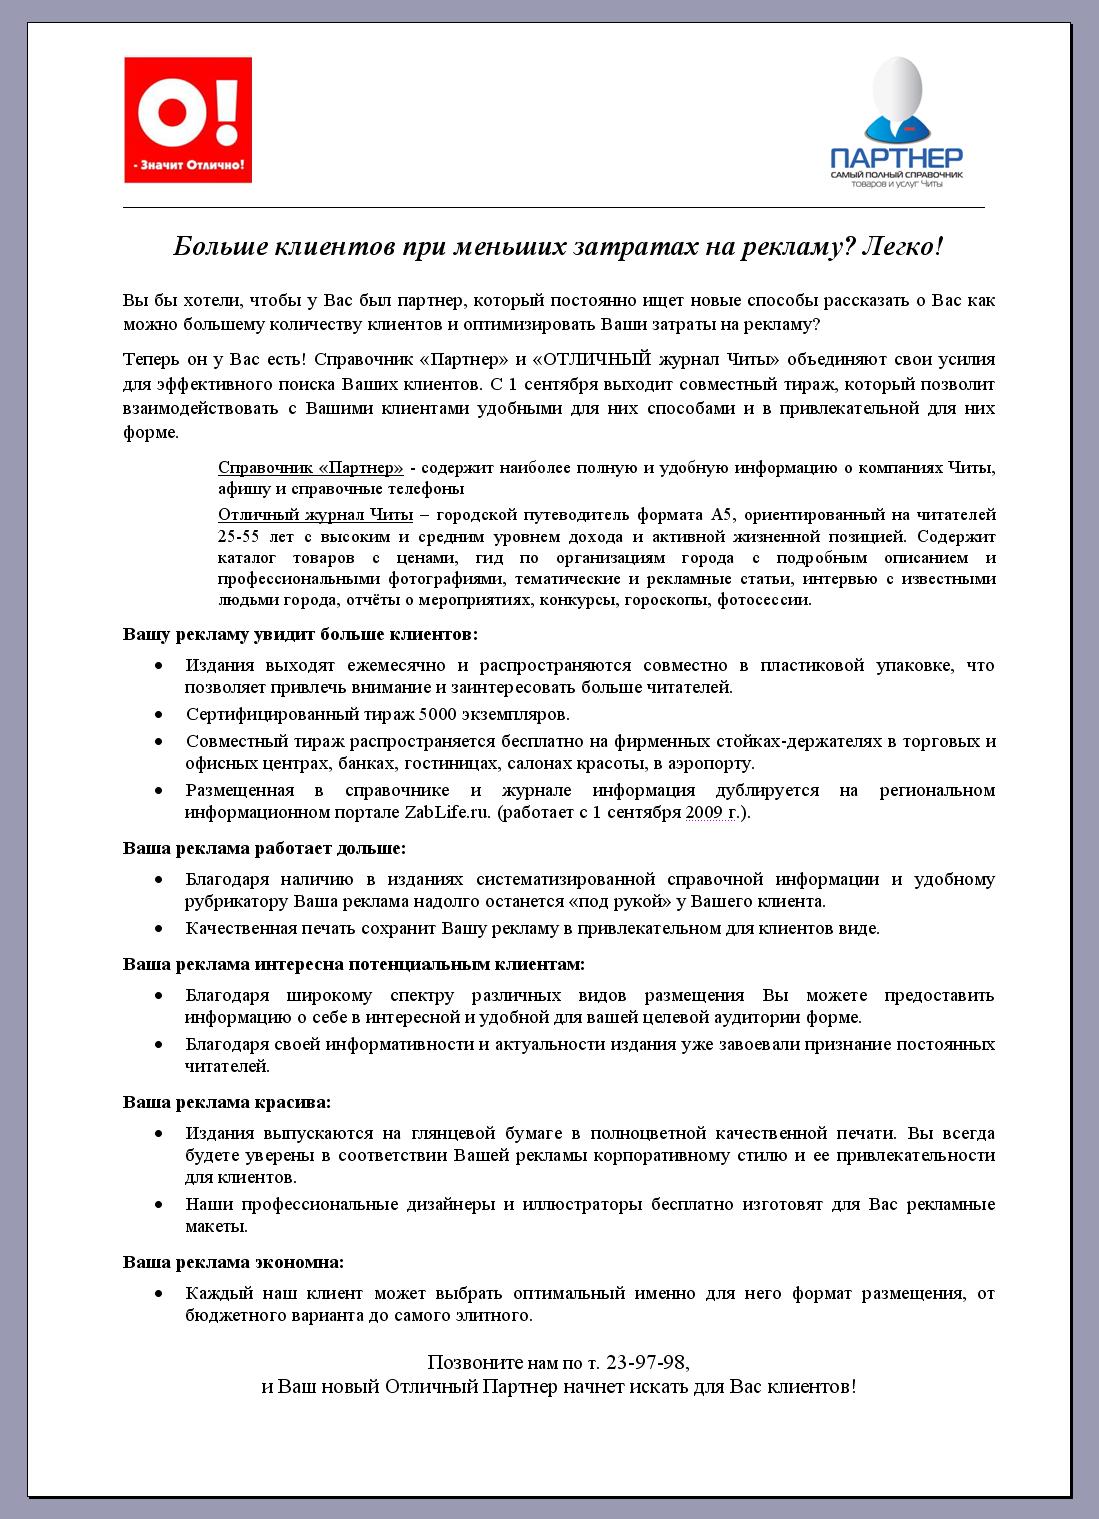 Коммерческое предложение Заблайф v1